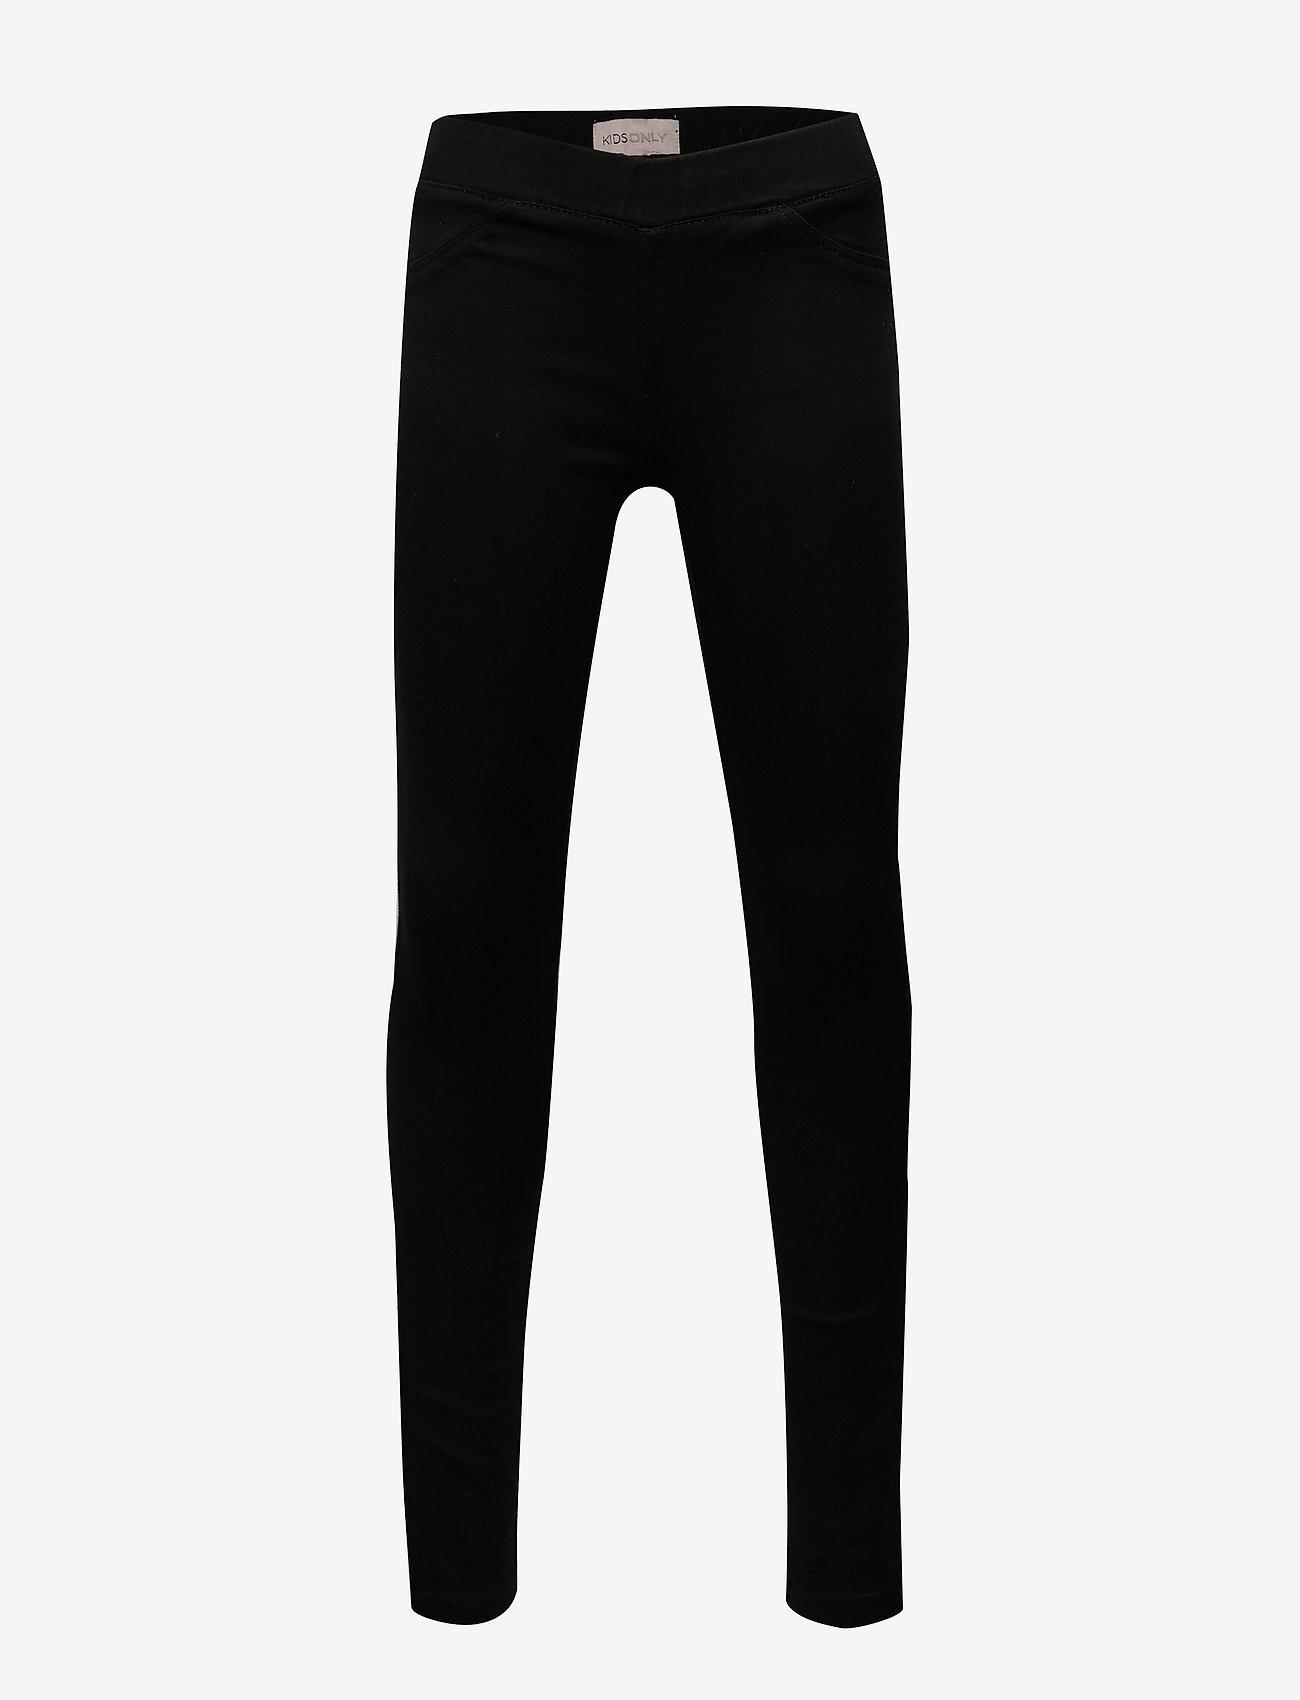 Kids Only - KONJUNE ROYAL DNM JEGGINGS 600 NOOS - leggings - black denim - 0